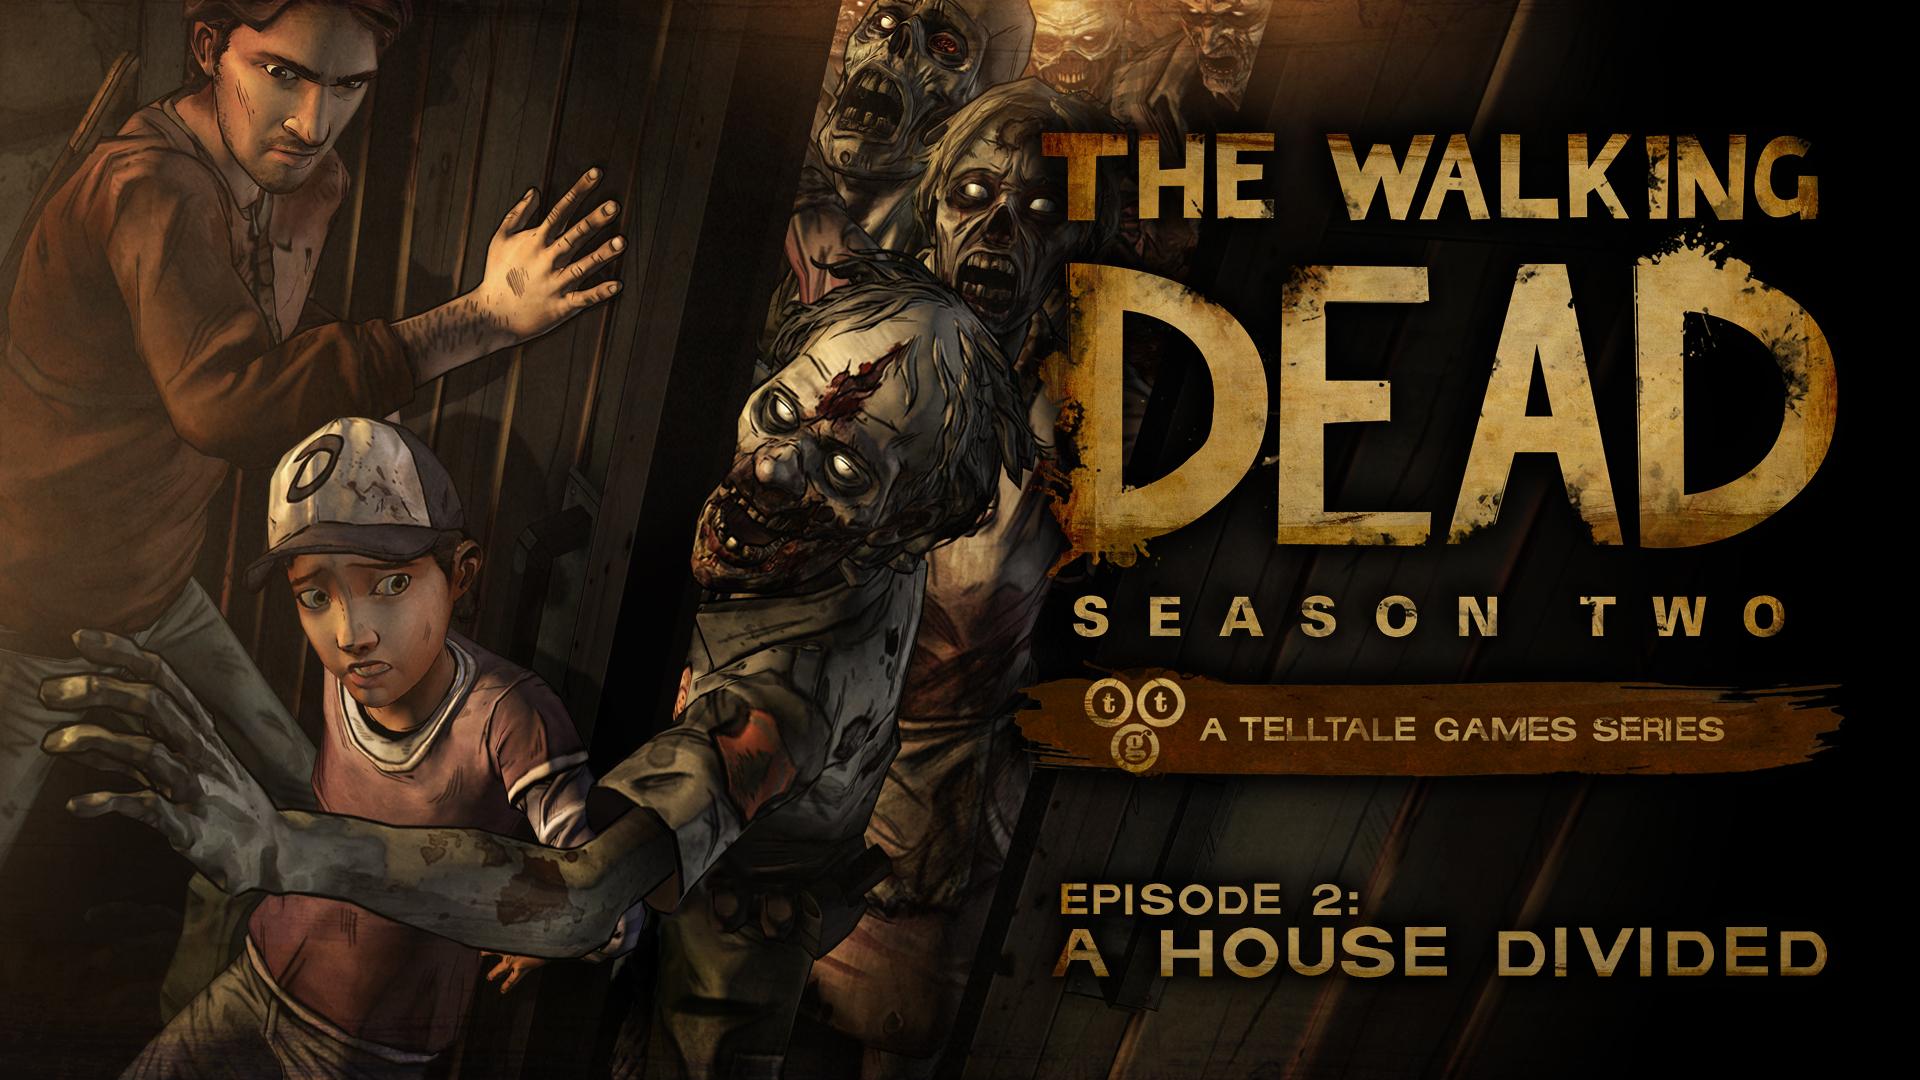 the walking dead season two review